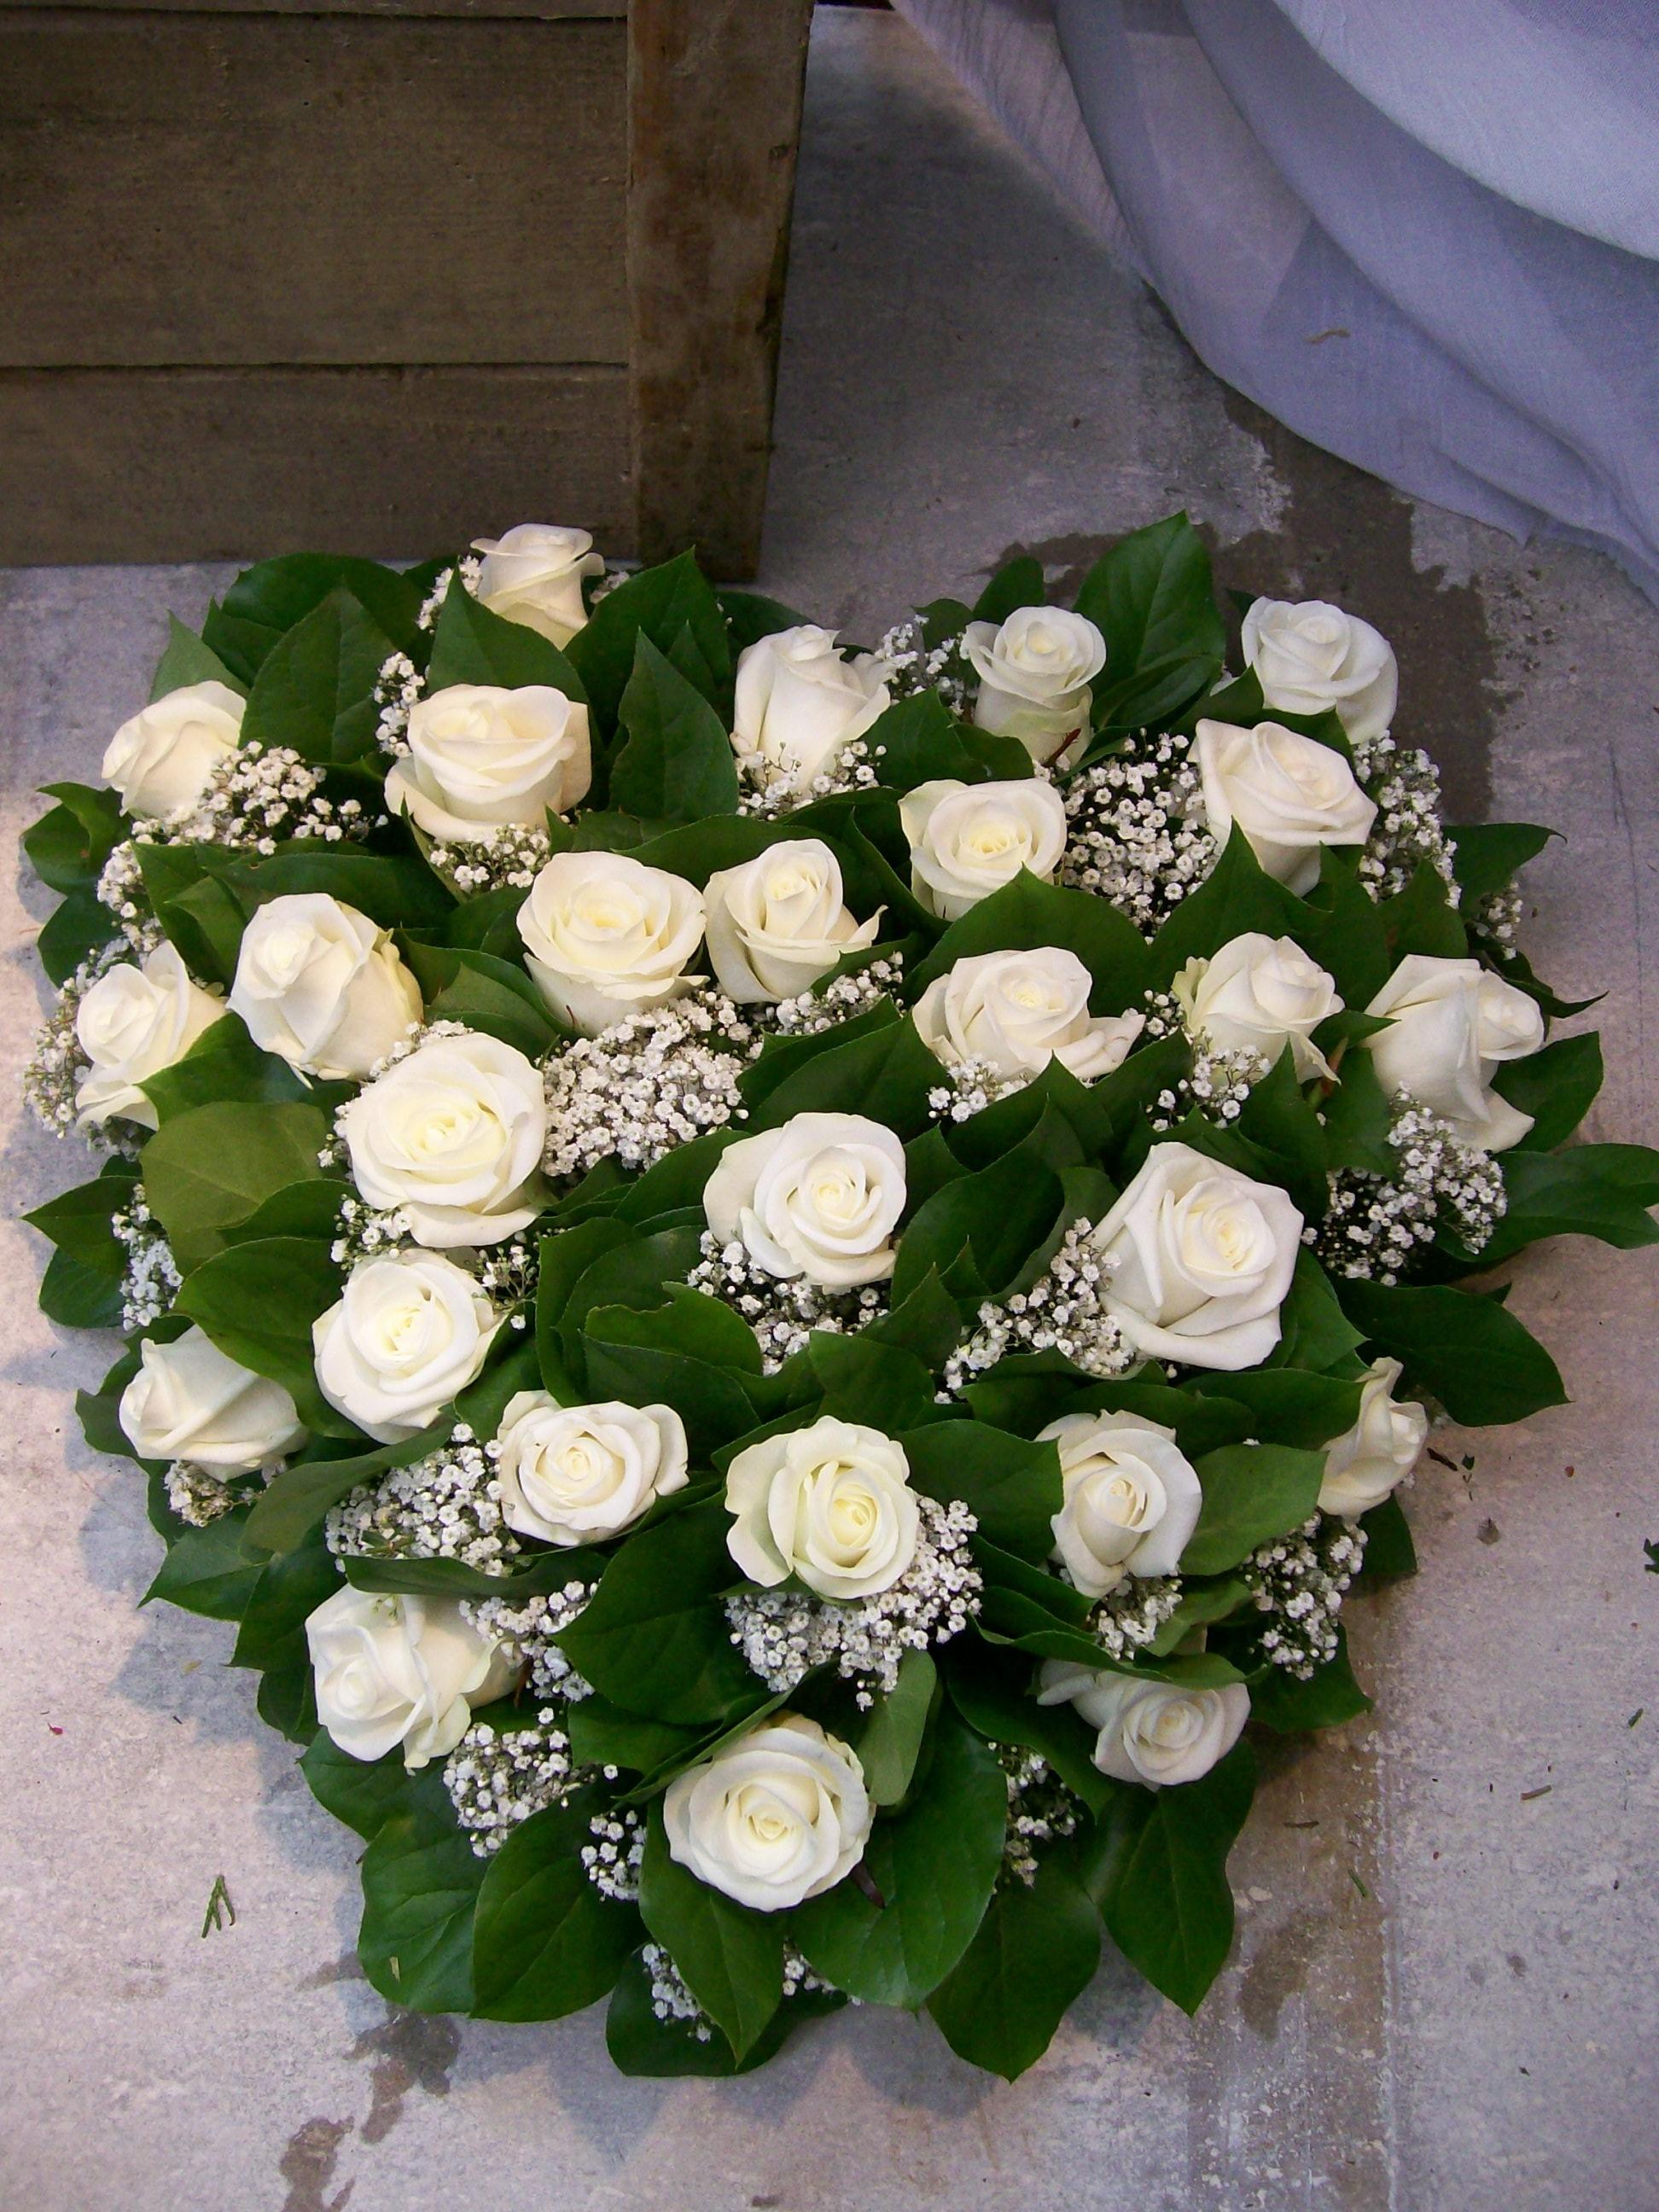 BL0 78 – Witte rozen Hart 40 cm – € 73